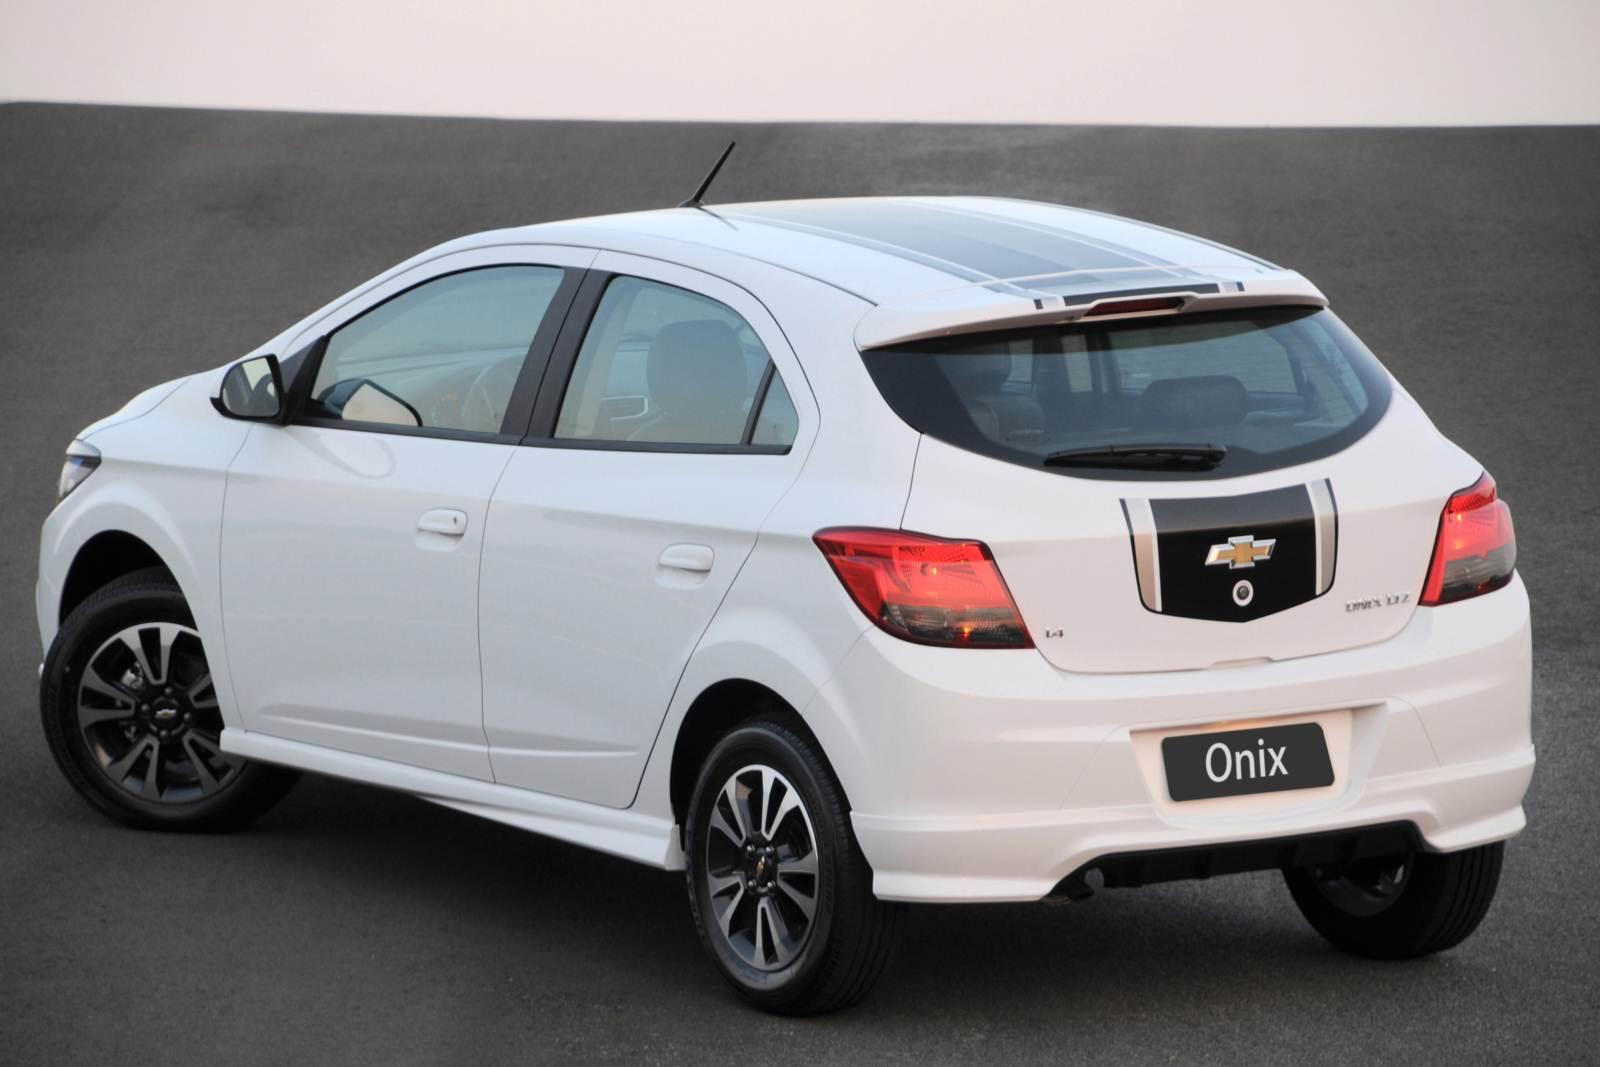 Onix 2014 Branco Chevrolet Onix Ltz 1.4 Branco